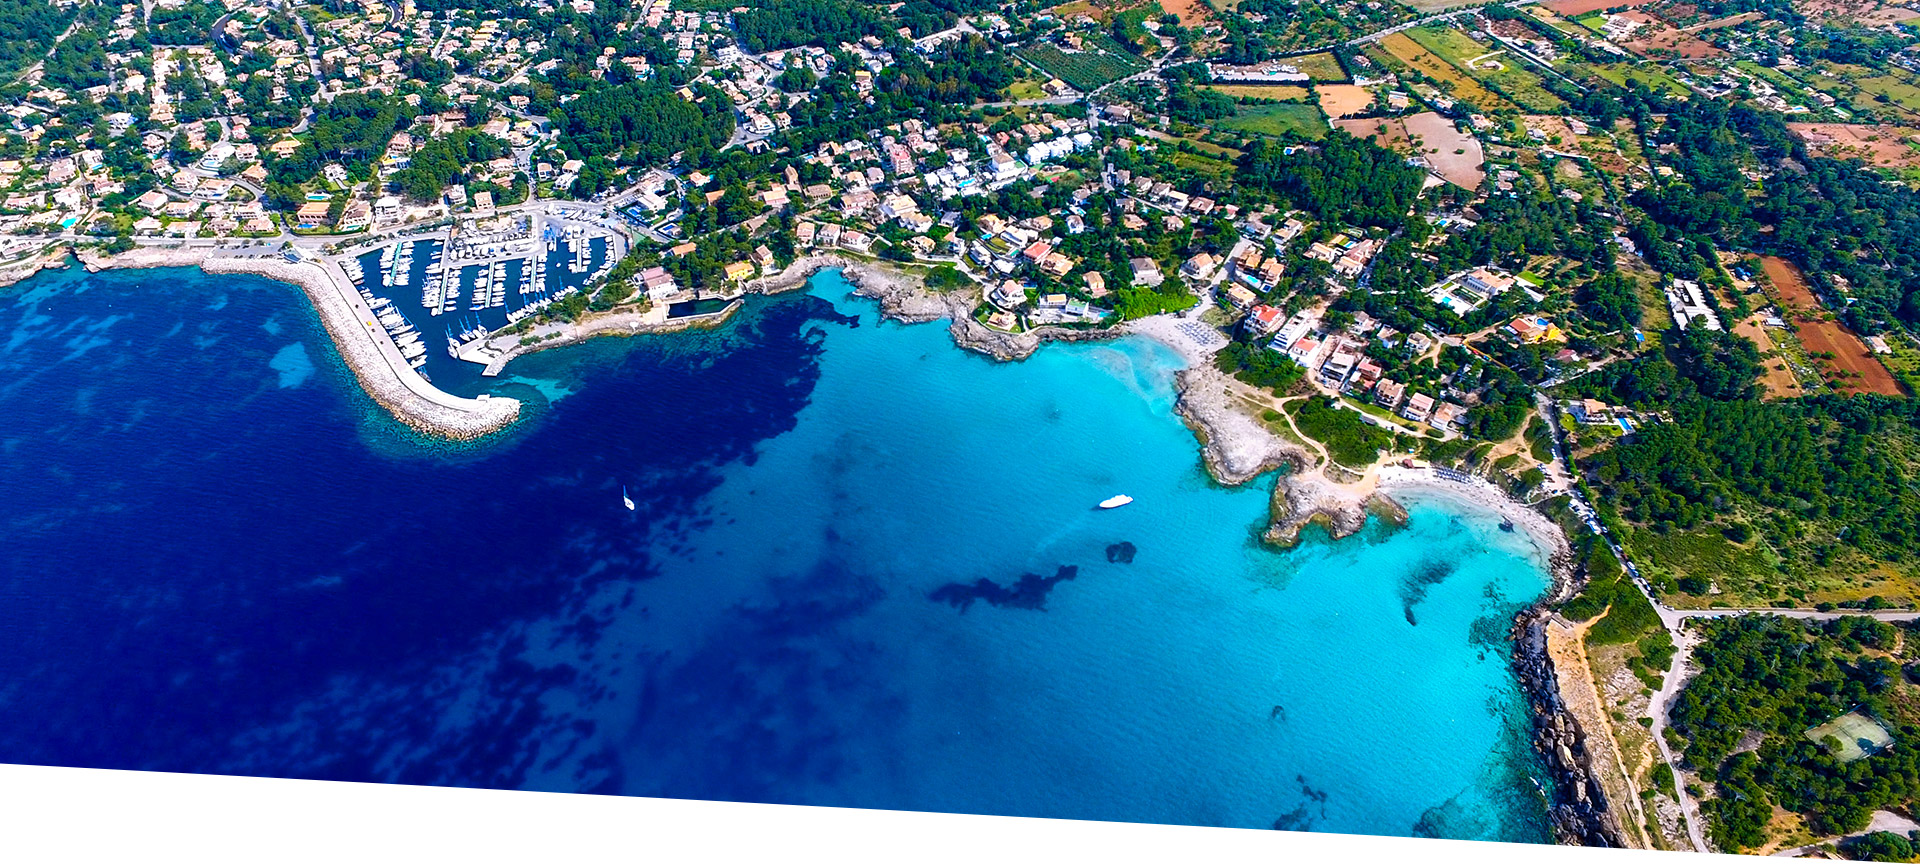 ImmobilienMAX24 Immobilienmakler Mallorca